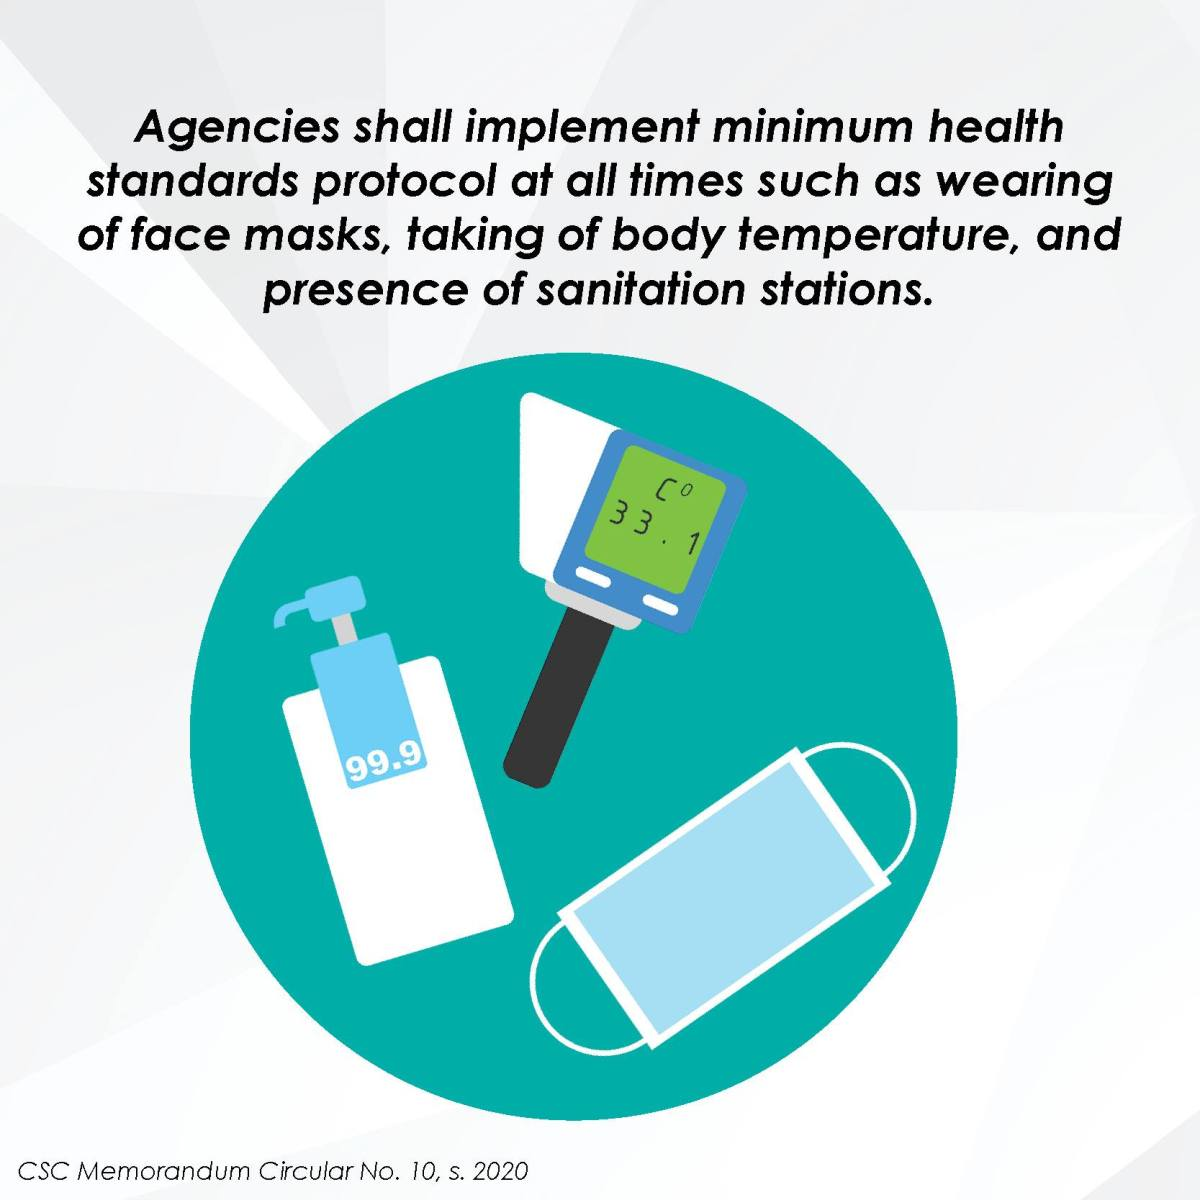 Agencies shall implement minimum health standards protocol